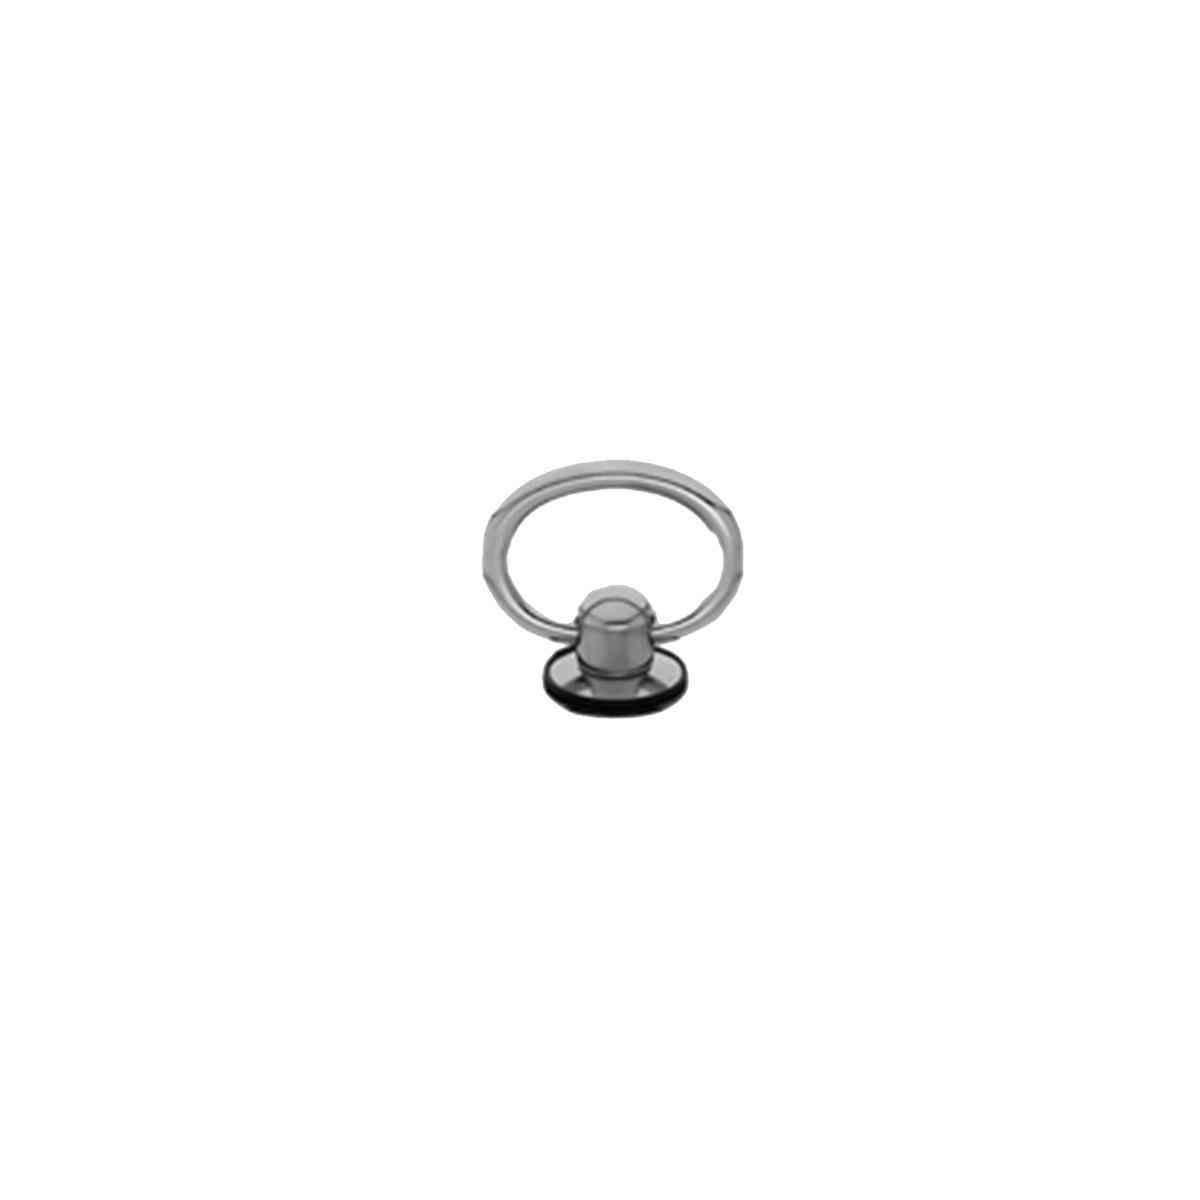 c+s royal lid handle